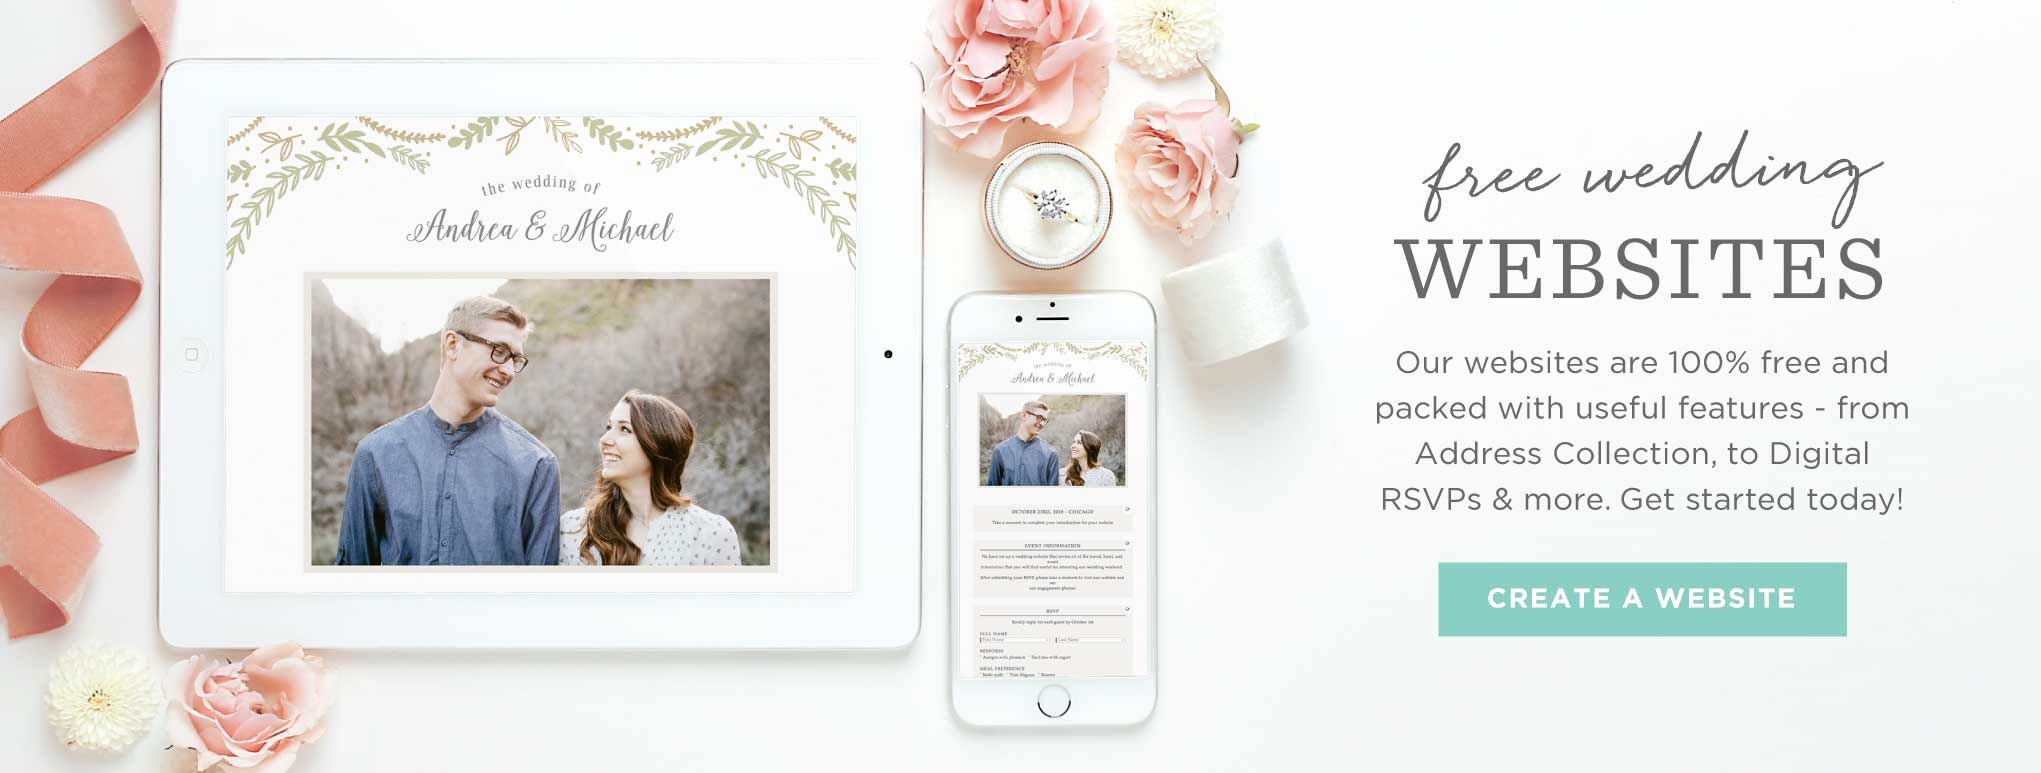 Best Wedding Invitation Sites Awesome Websites